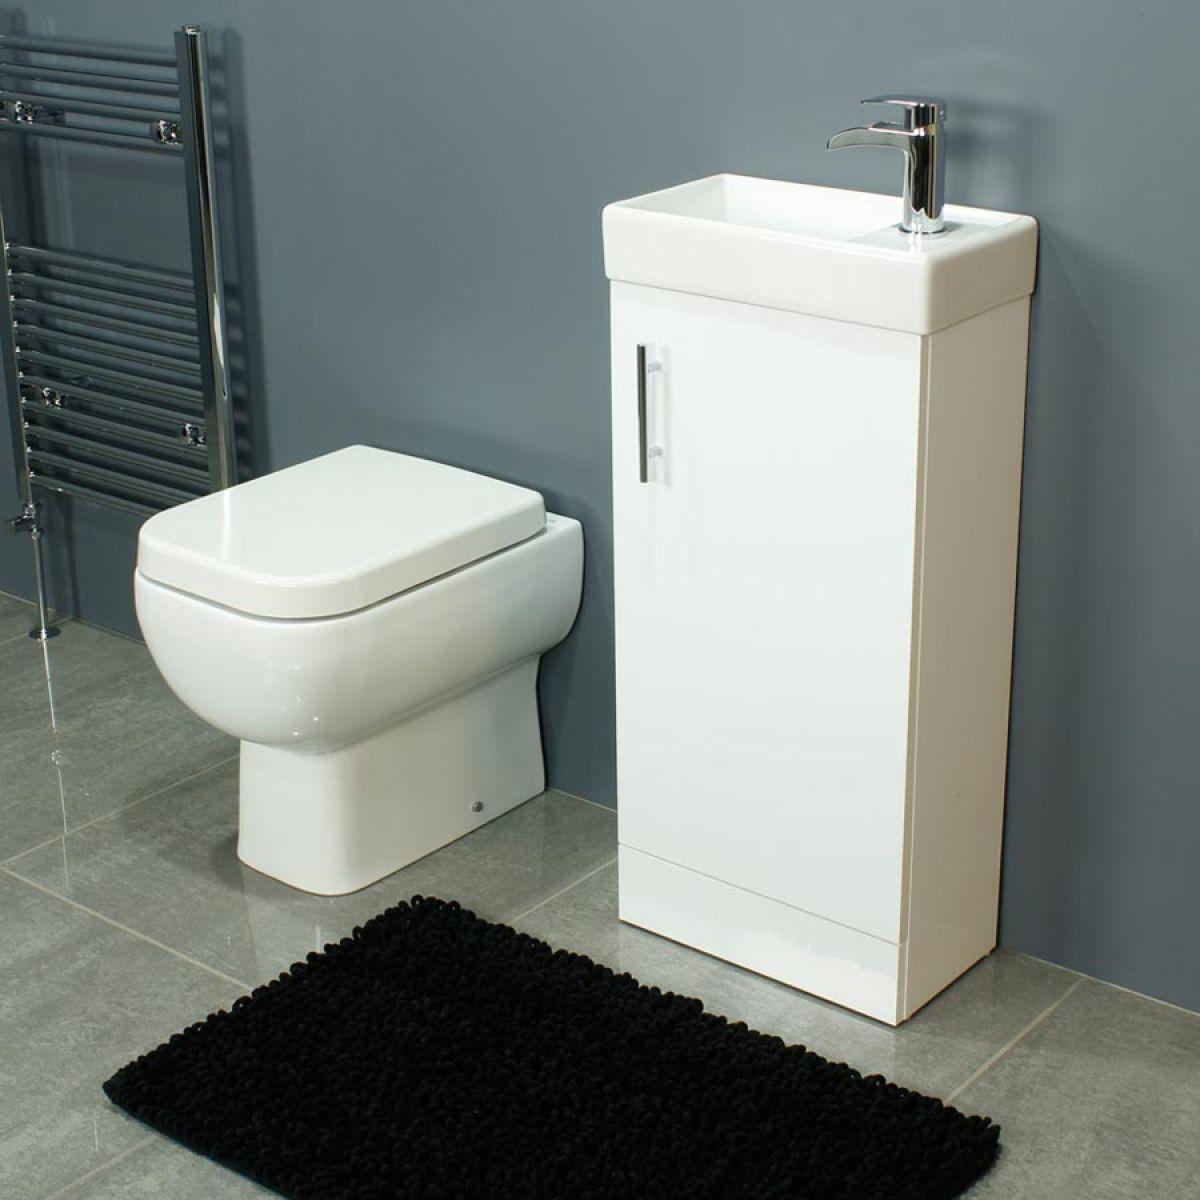 RAK Series 600 Back To Wall Toilet and 400 Series Gloss White Vanity Unit